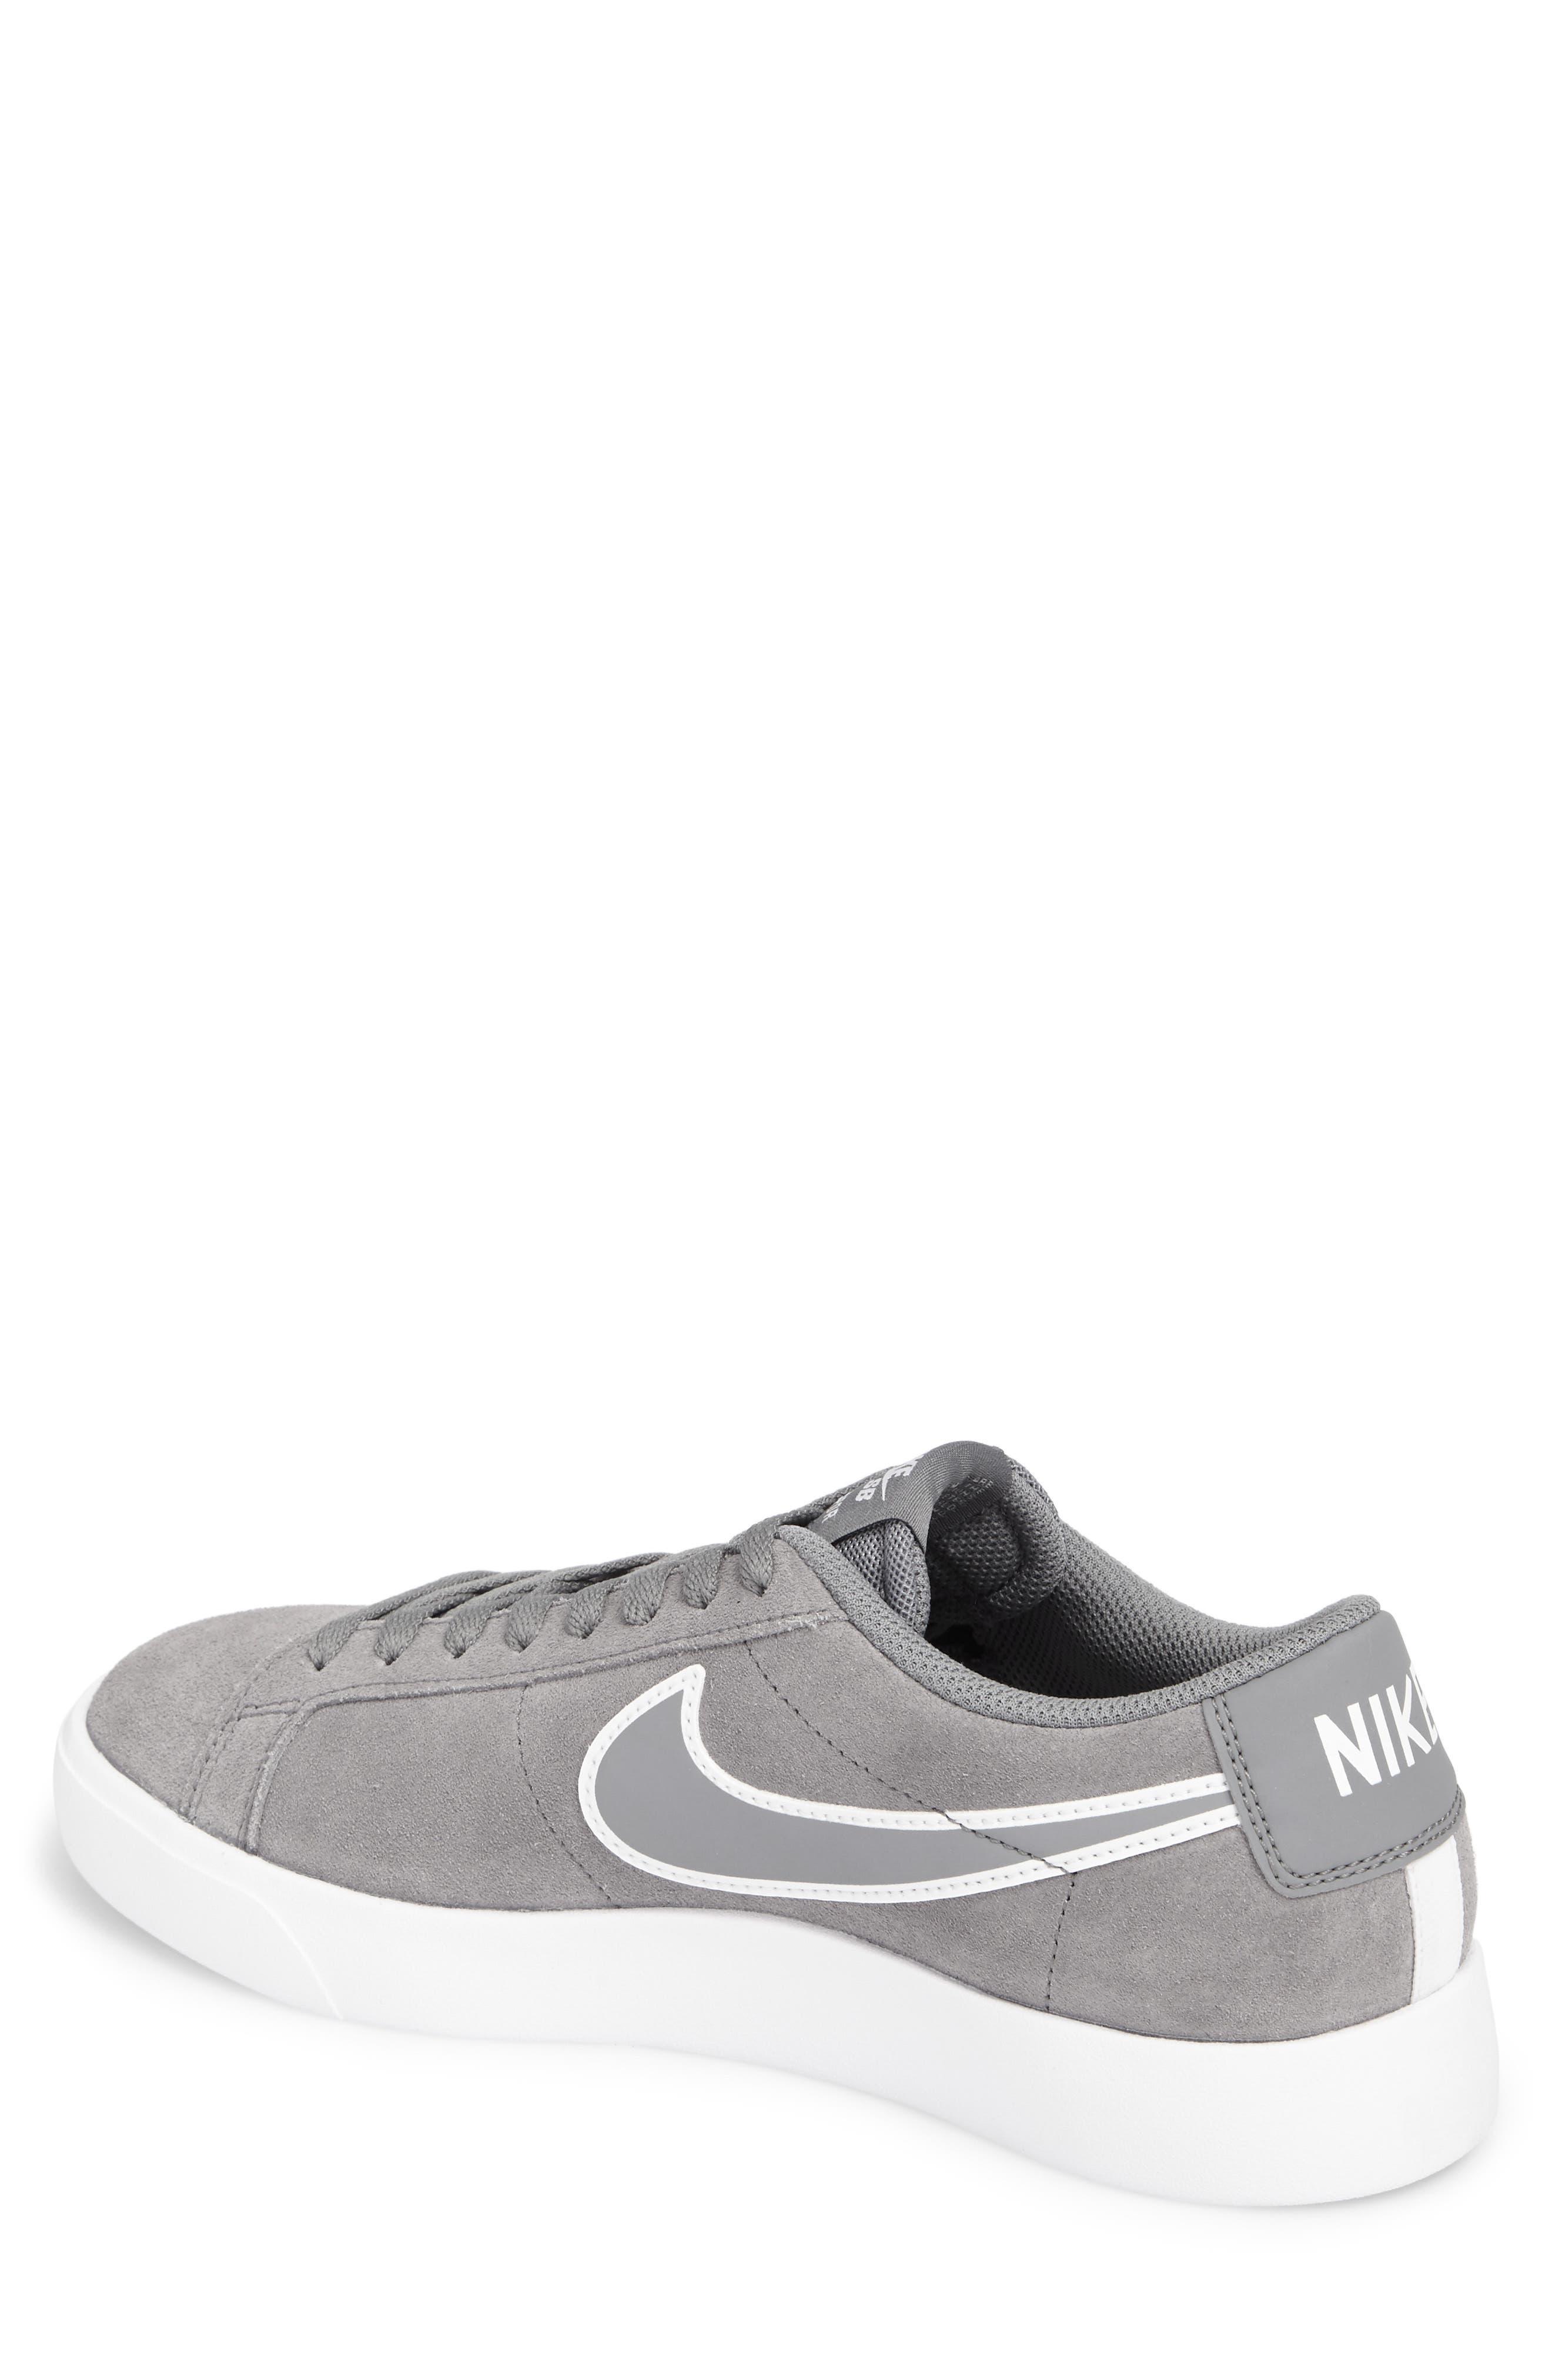 SB Blazer Vapor Skateboarding Sneaker,                             Alternate thumbnail 2, color,                             Cool Grey/Cool Grey/White